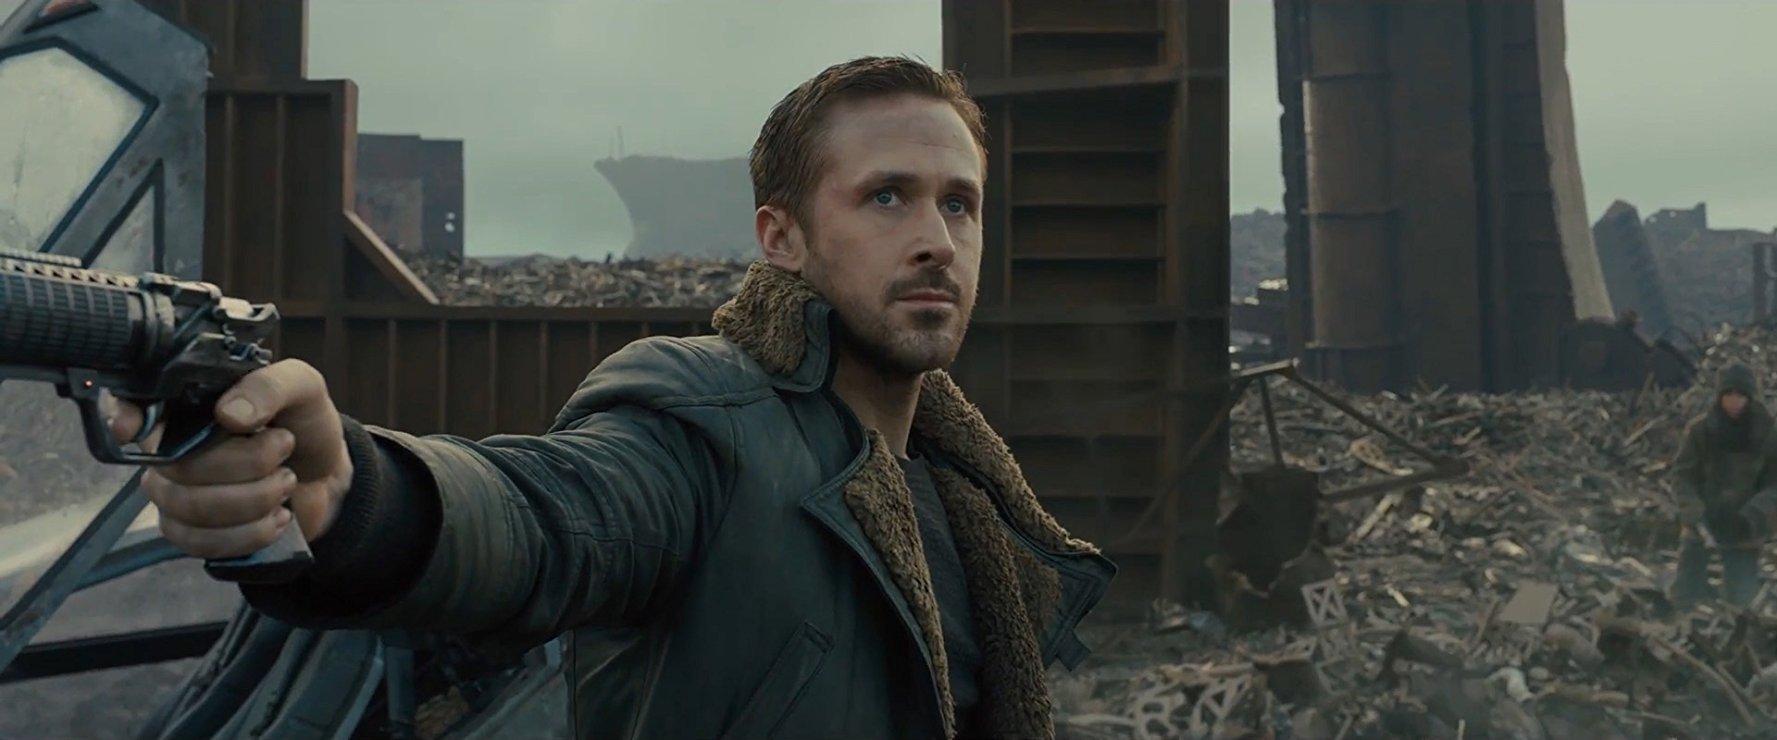 Blade Runner 2049 | IMDB